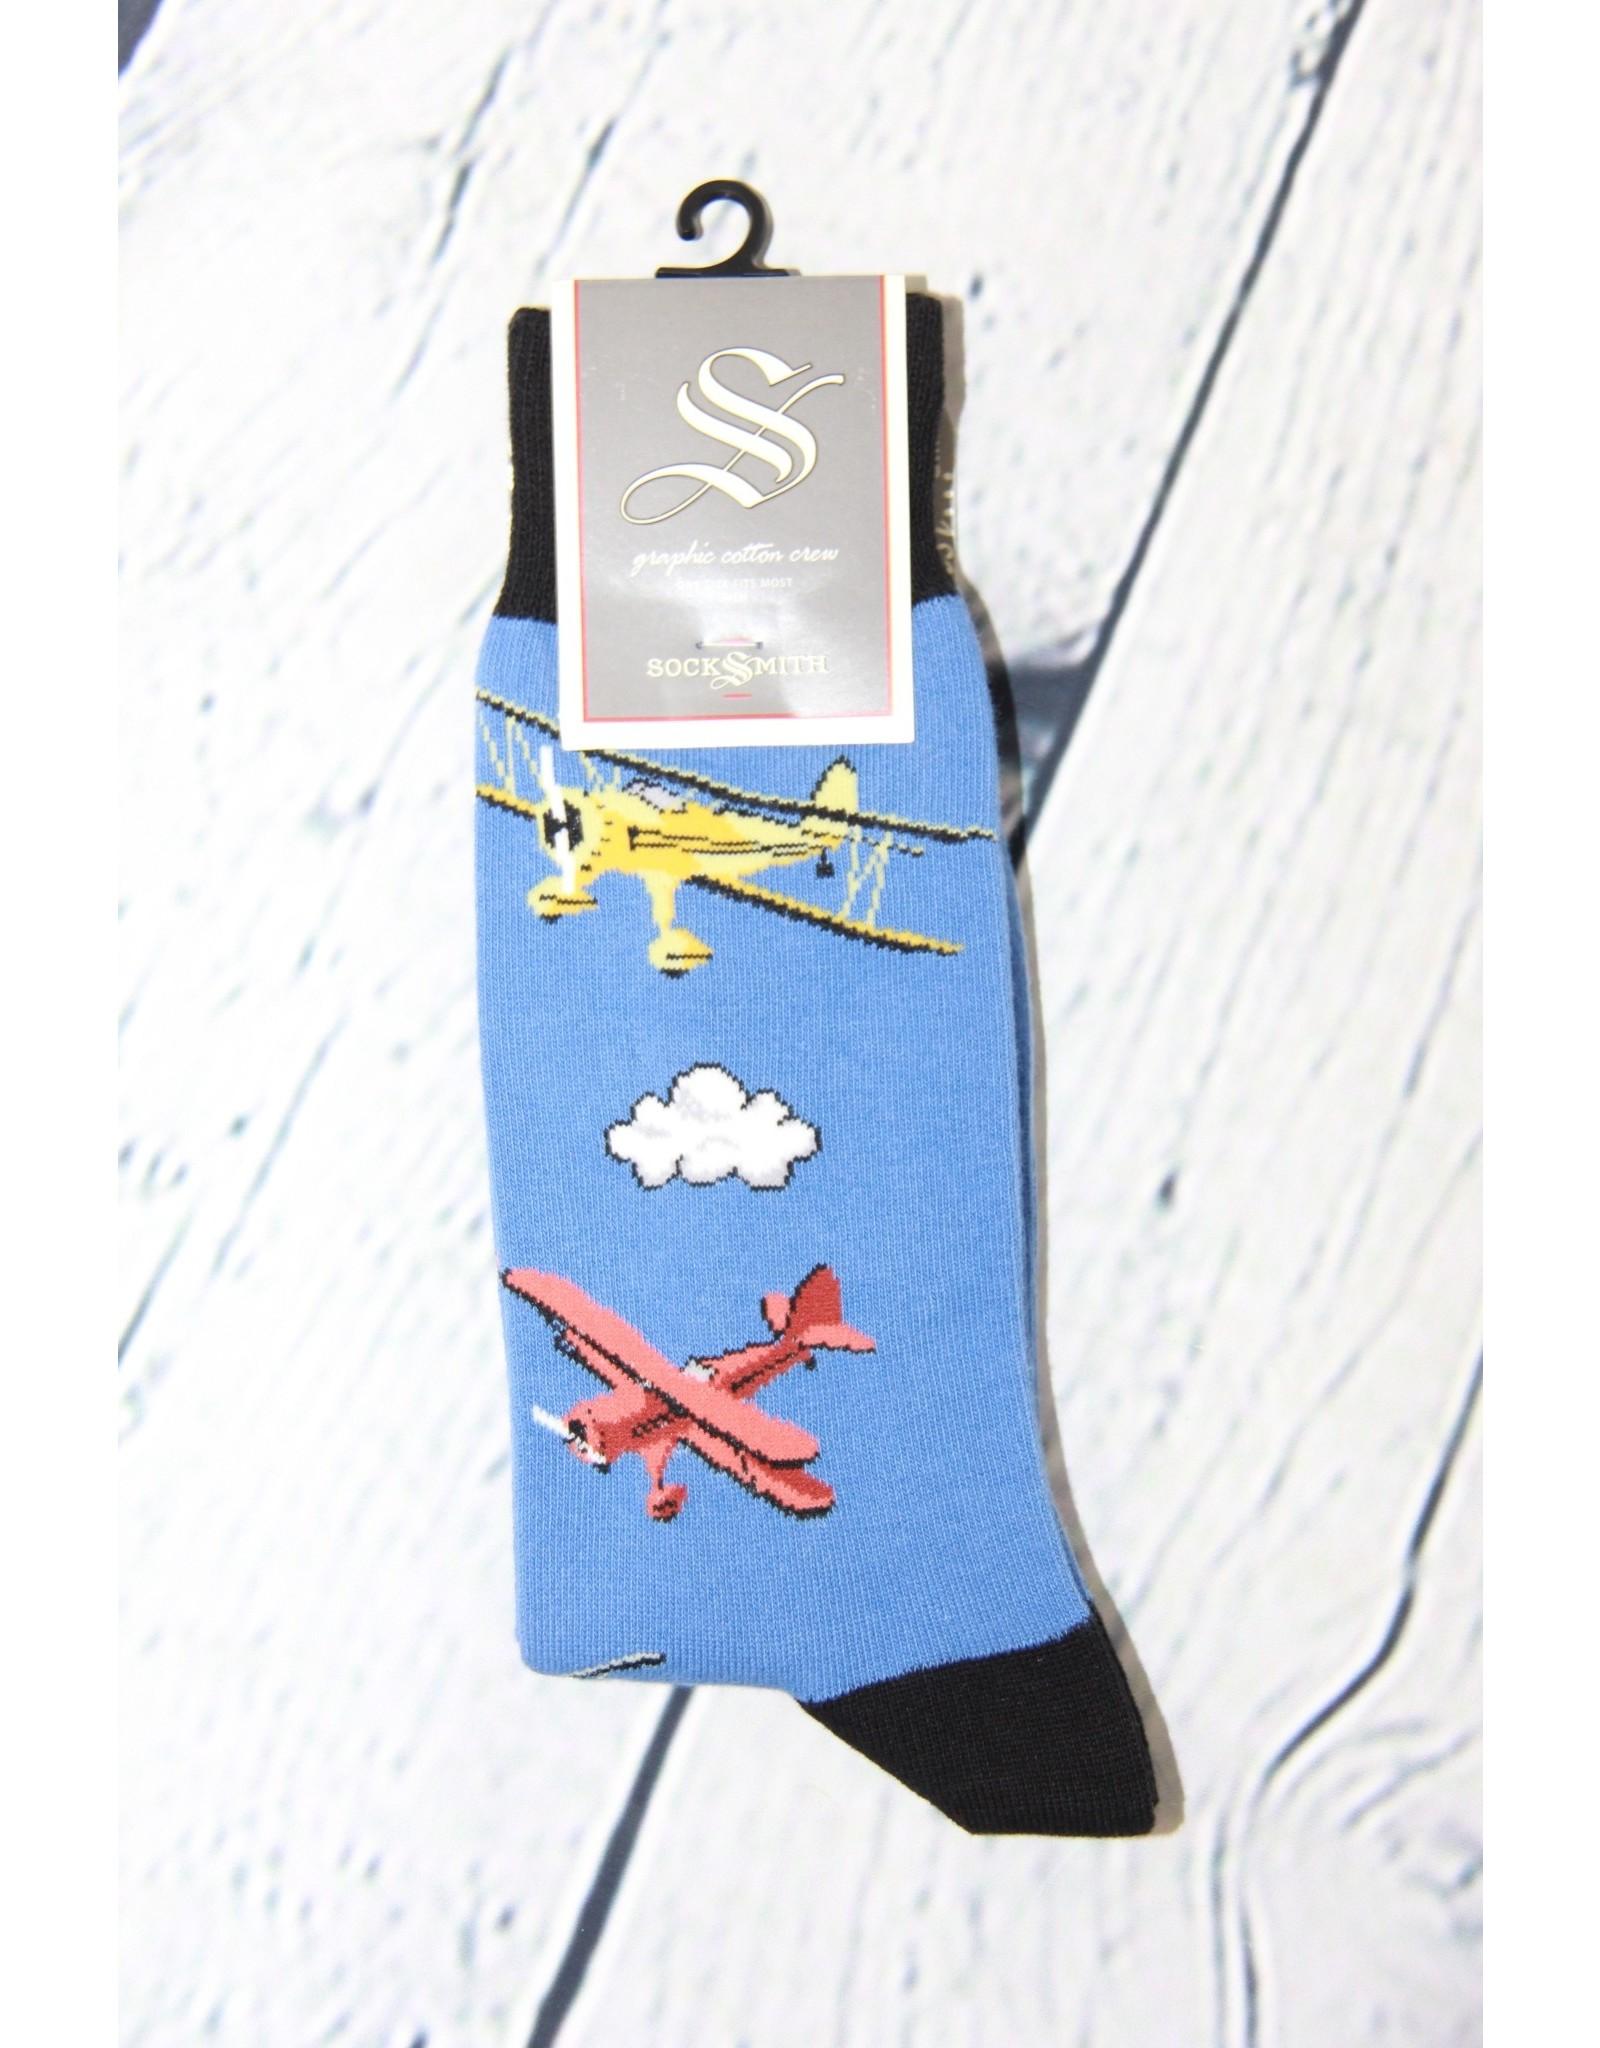 SockSmith Flying By Sock